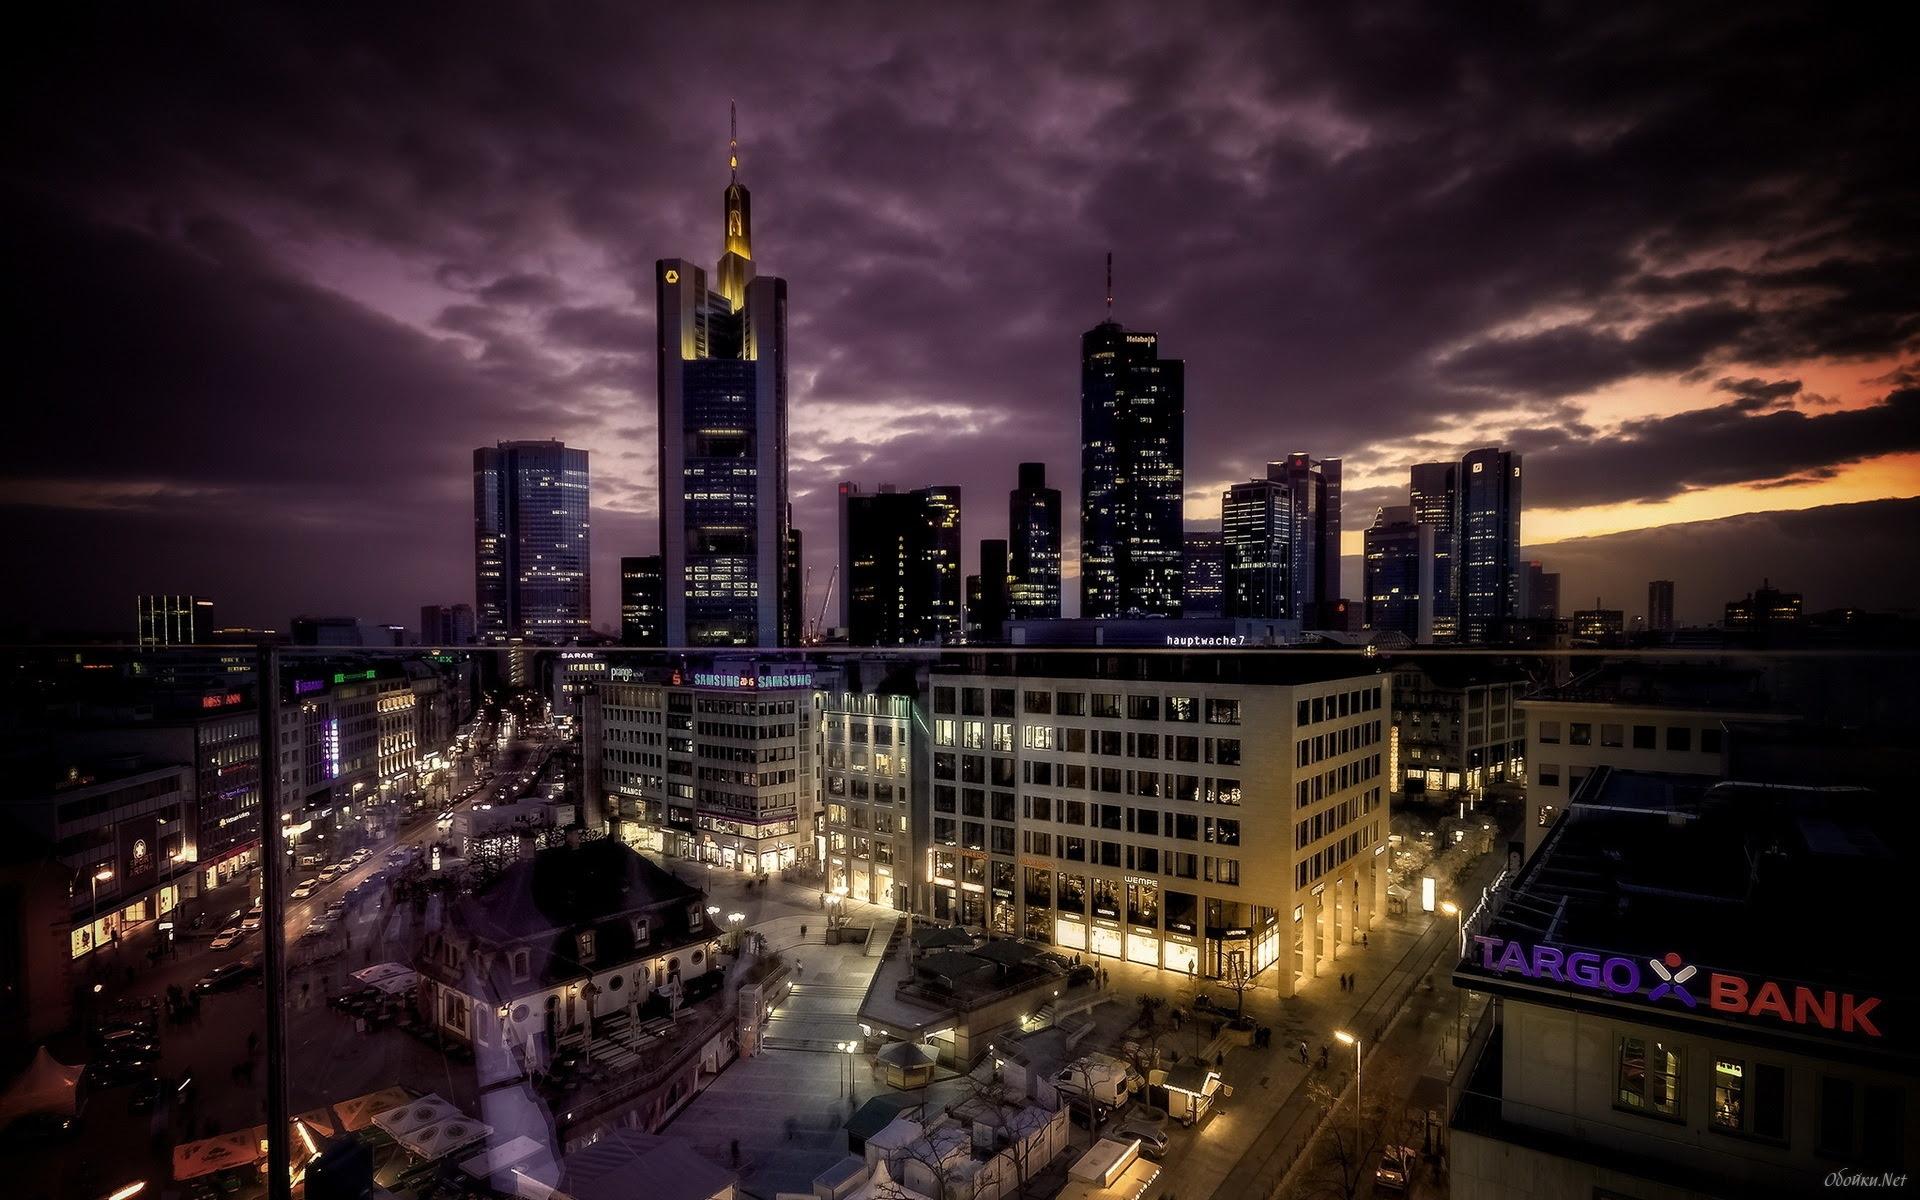 City Night Wallpaper HD - WallpaperSafari